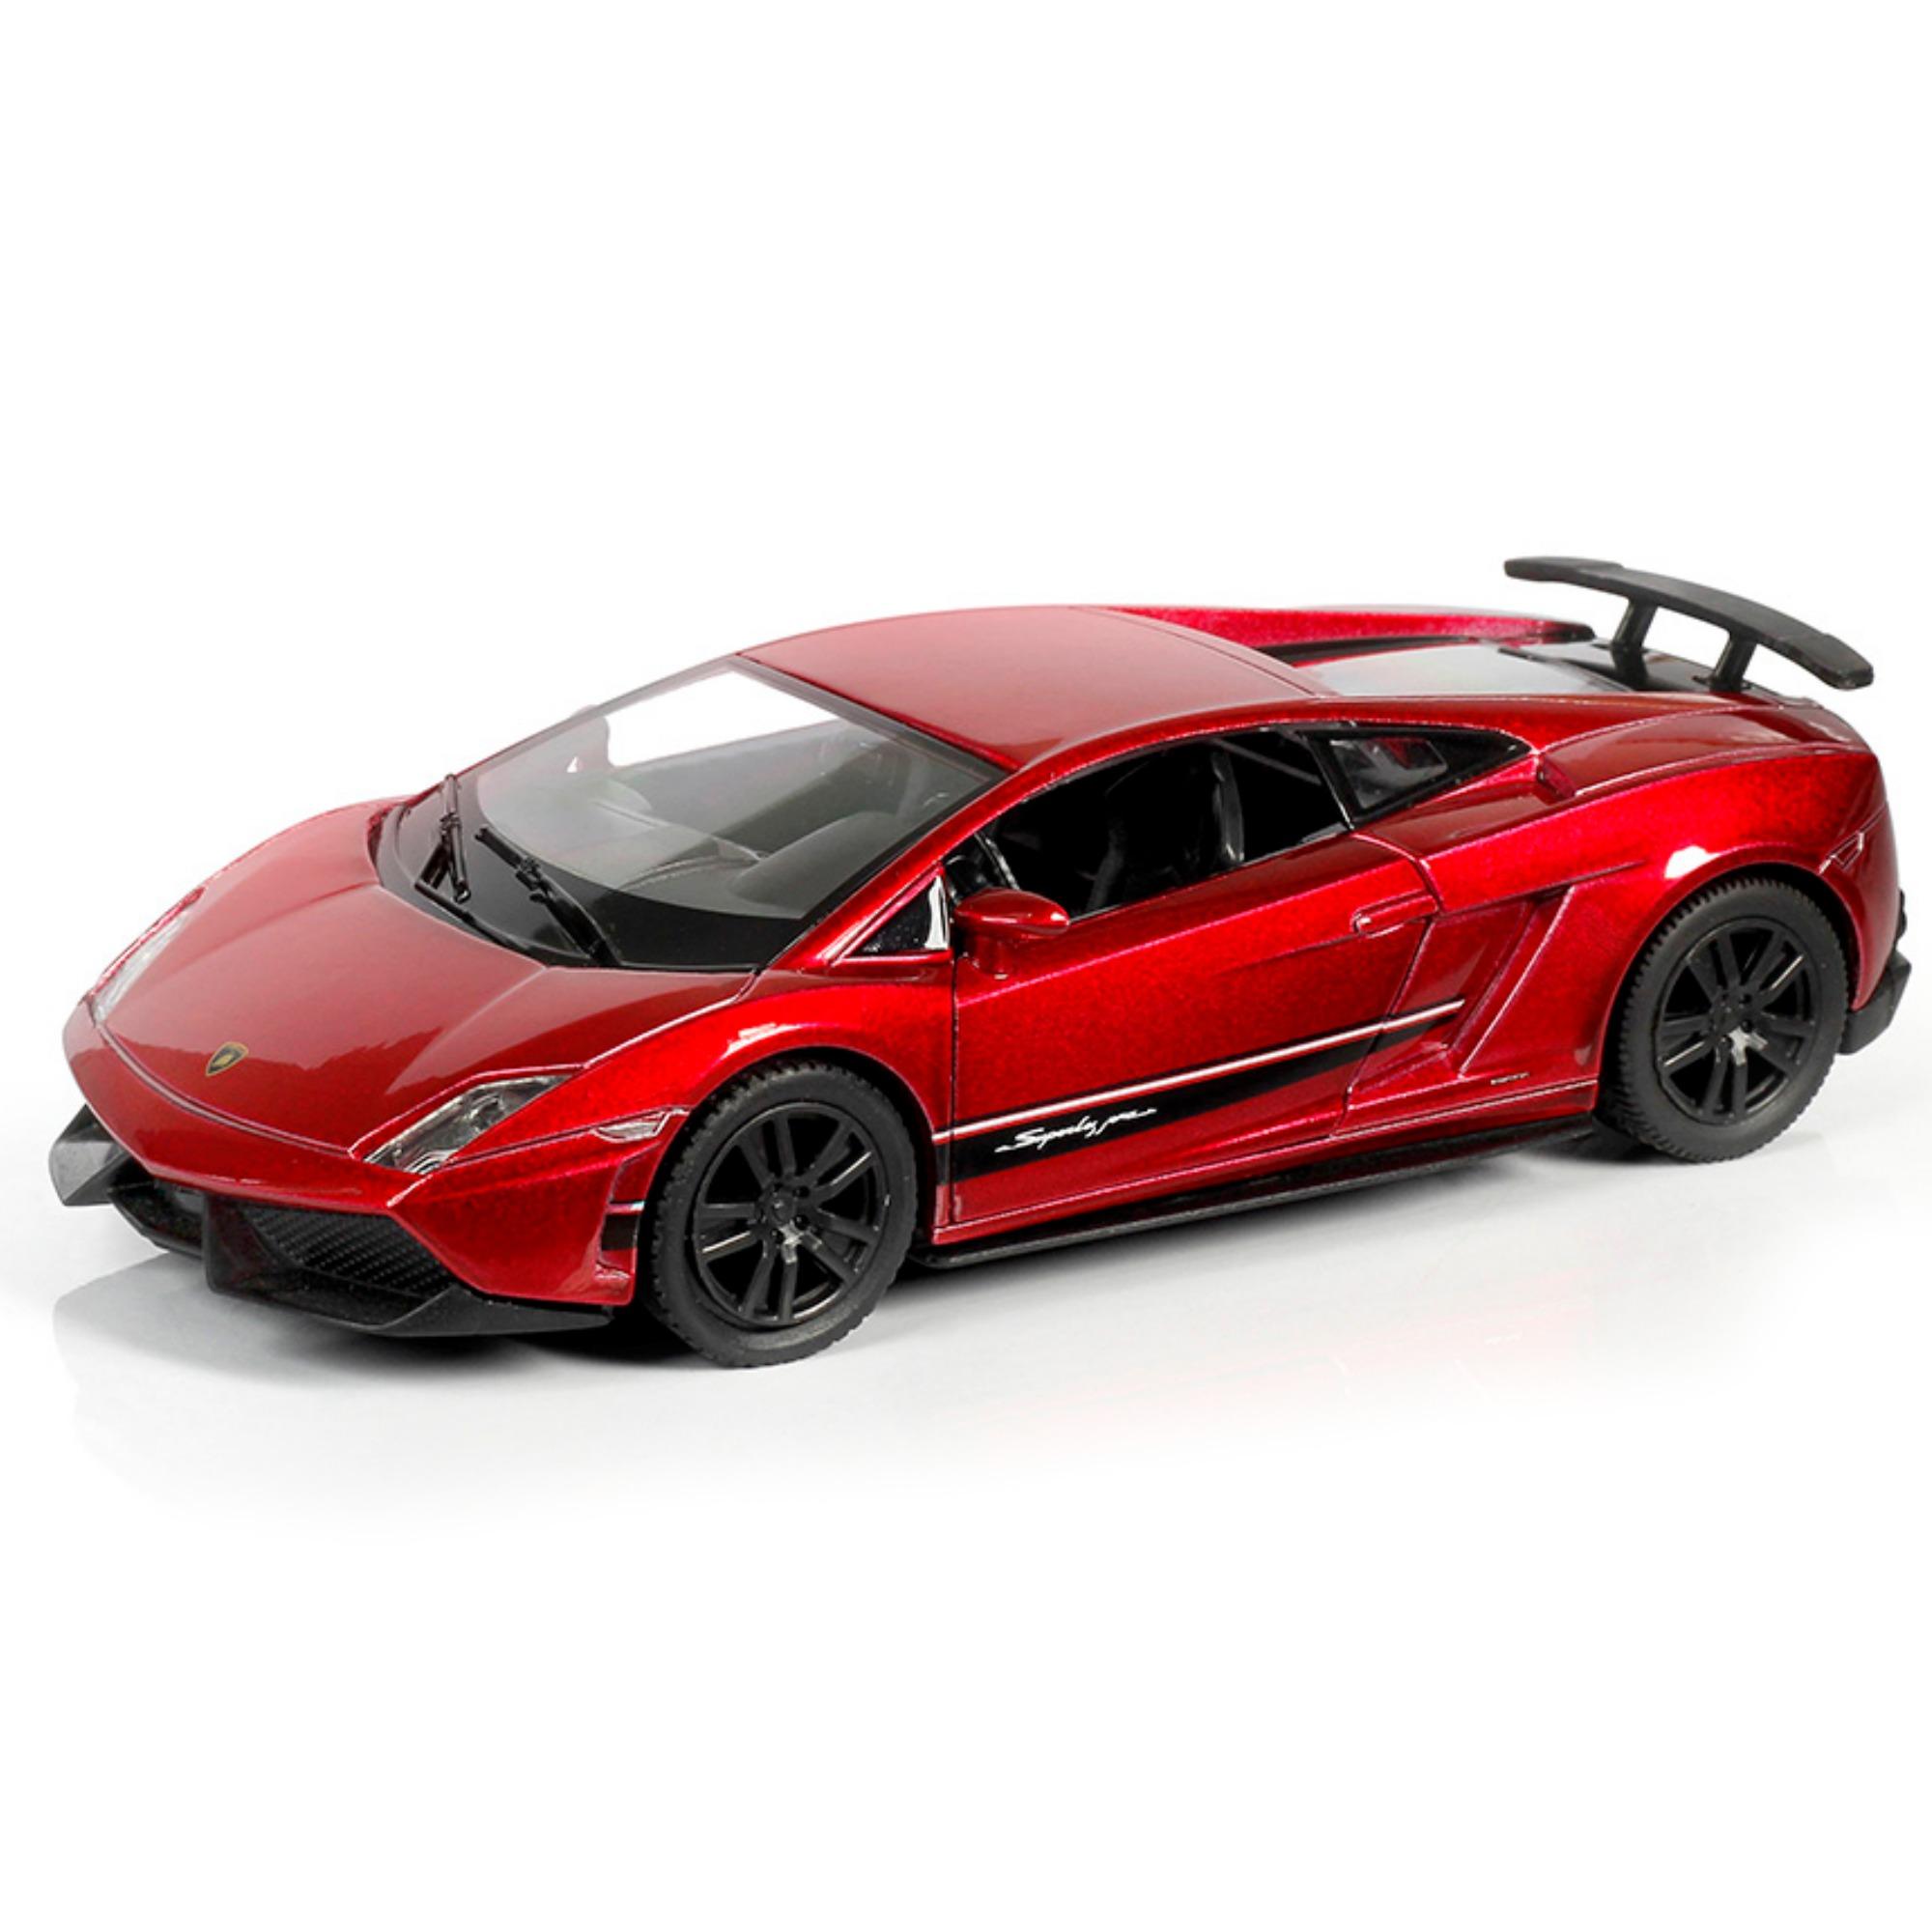 Картинки моделей машин